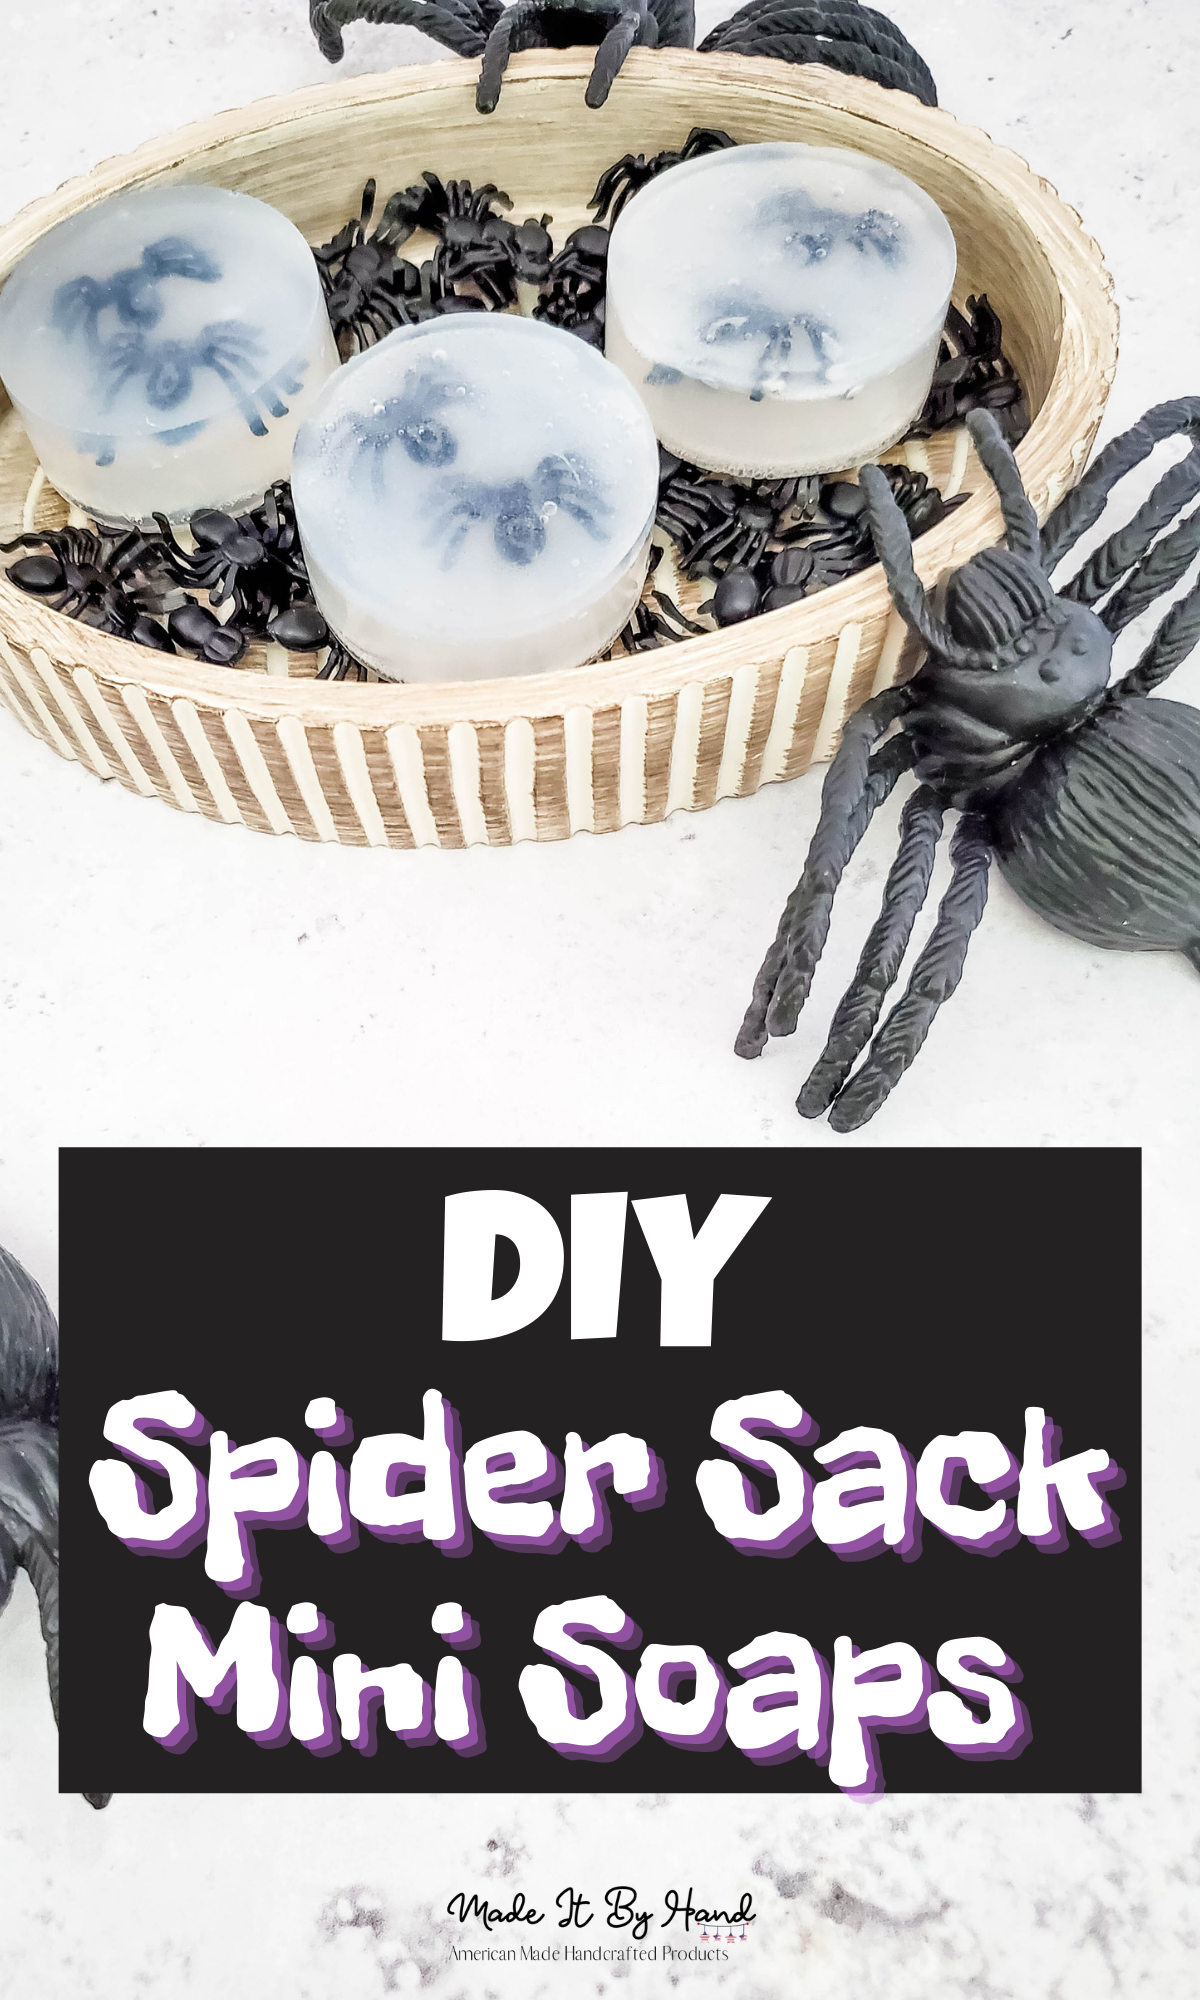 DIY Spider sack mini soaps